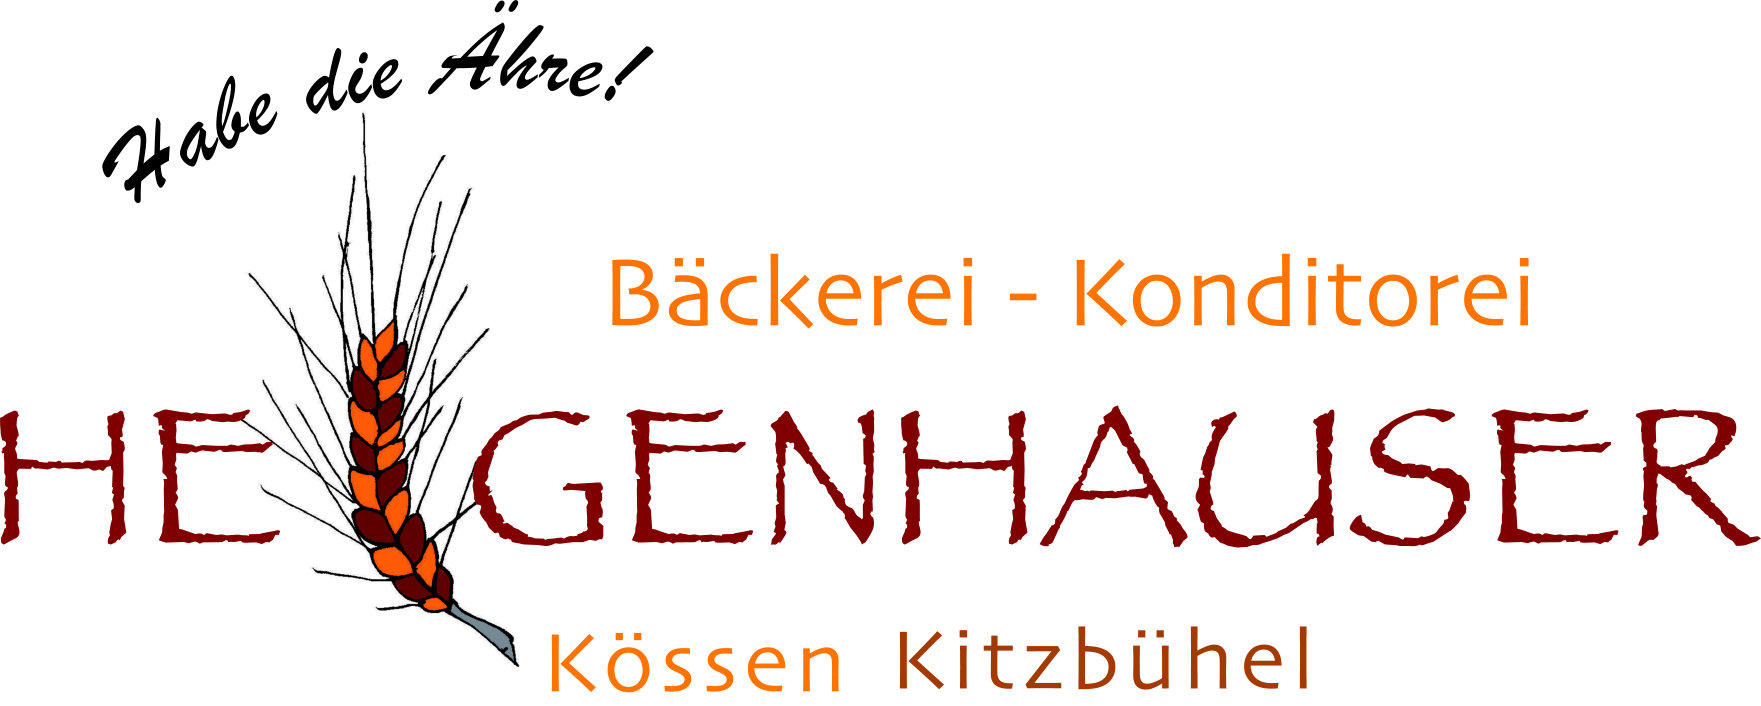 Bäckerei Konditorei Heigenhauser in Kössen, Kitzbühel, Waidring